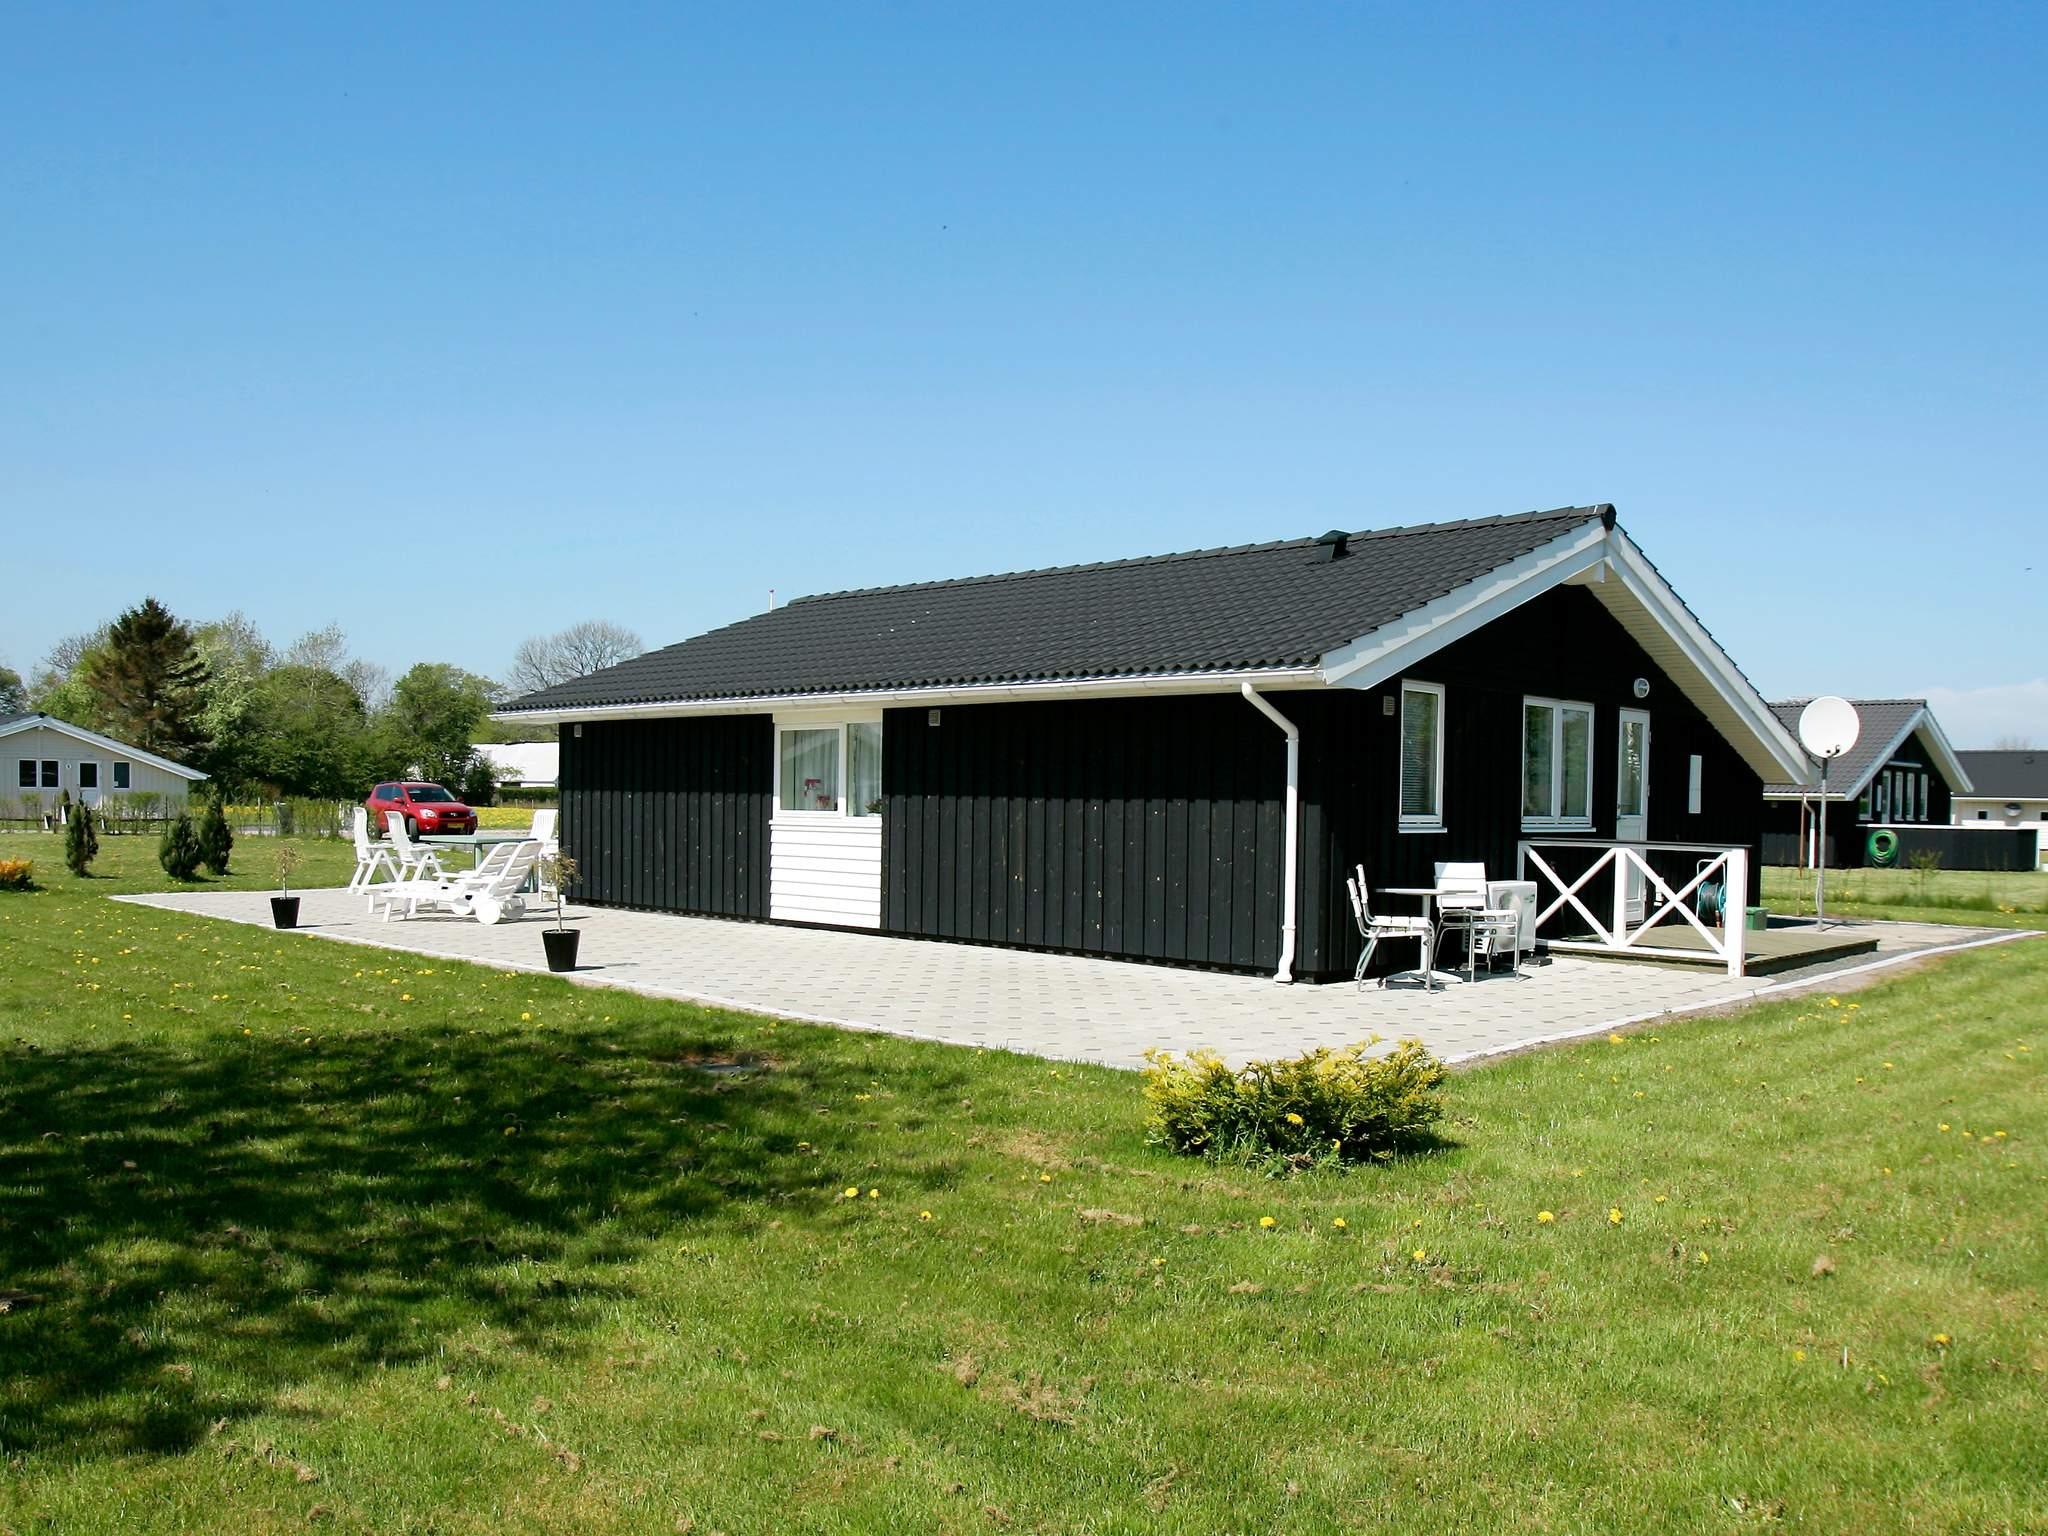 Ferienhaus Øster Hurup (480896), Øster Hurup, , Ostjütland, Dänemark, Bild 10